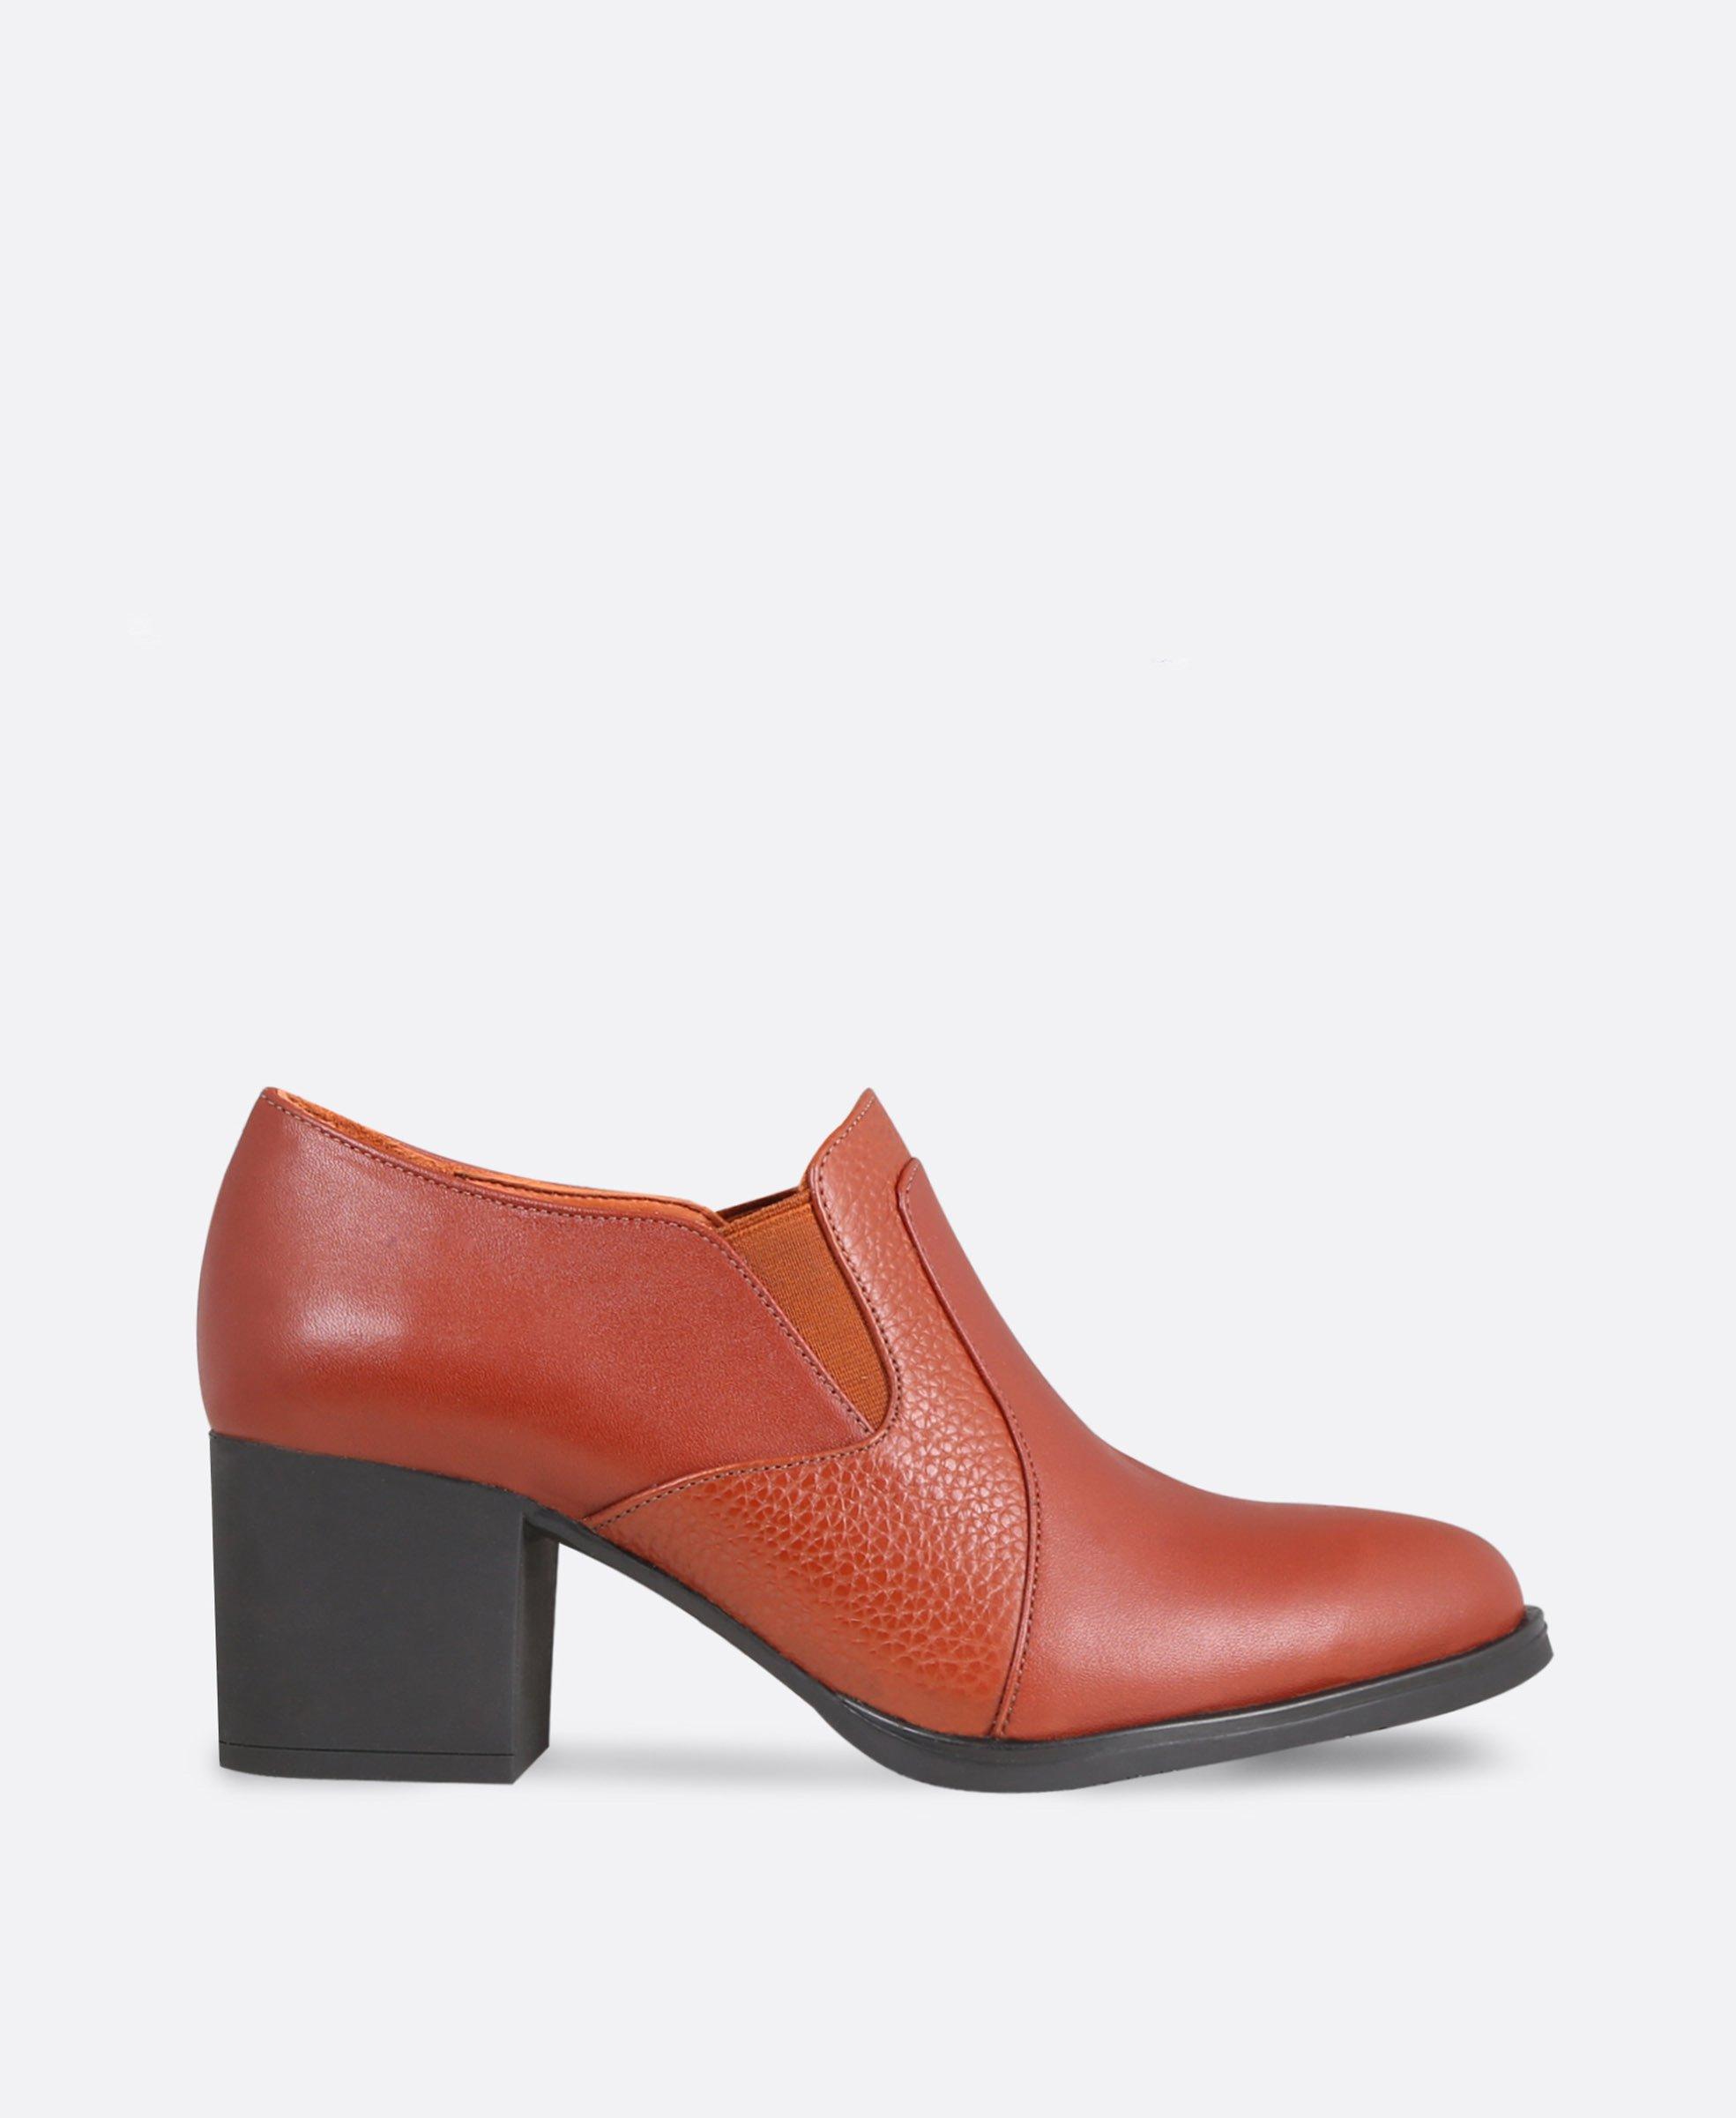 کفش زنانه چرم 0261